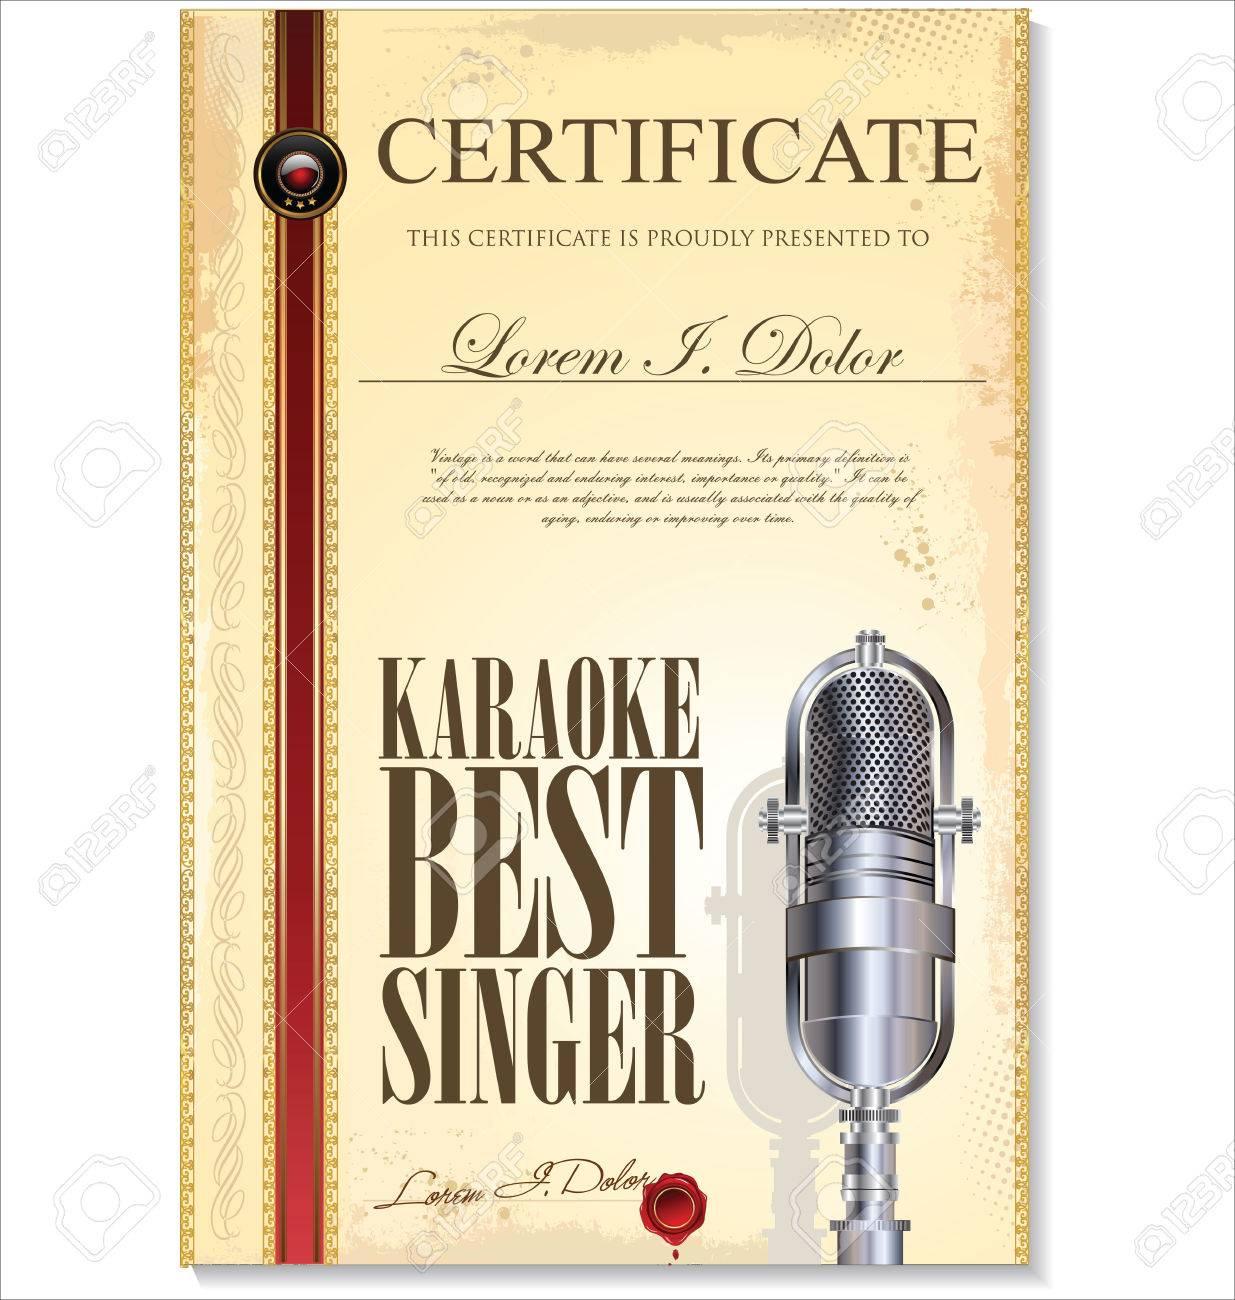 Karaoke certificate template best singer karaoke certificate template best singer 23320072 yelopaper Image collections